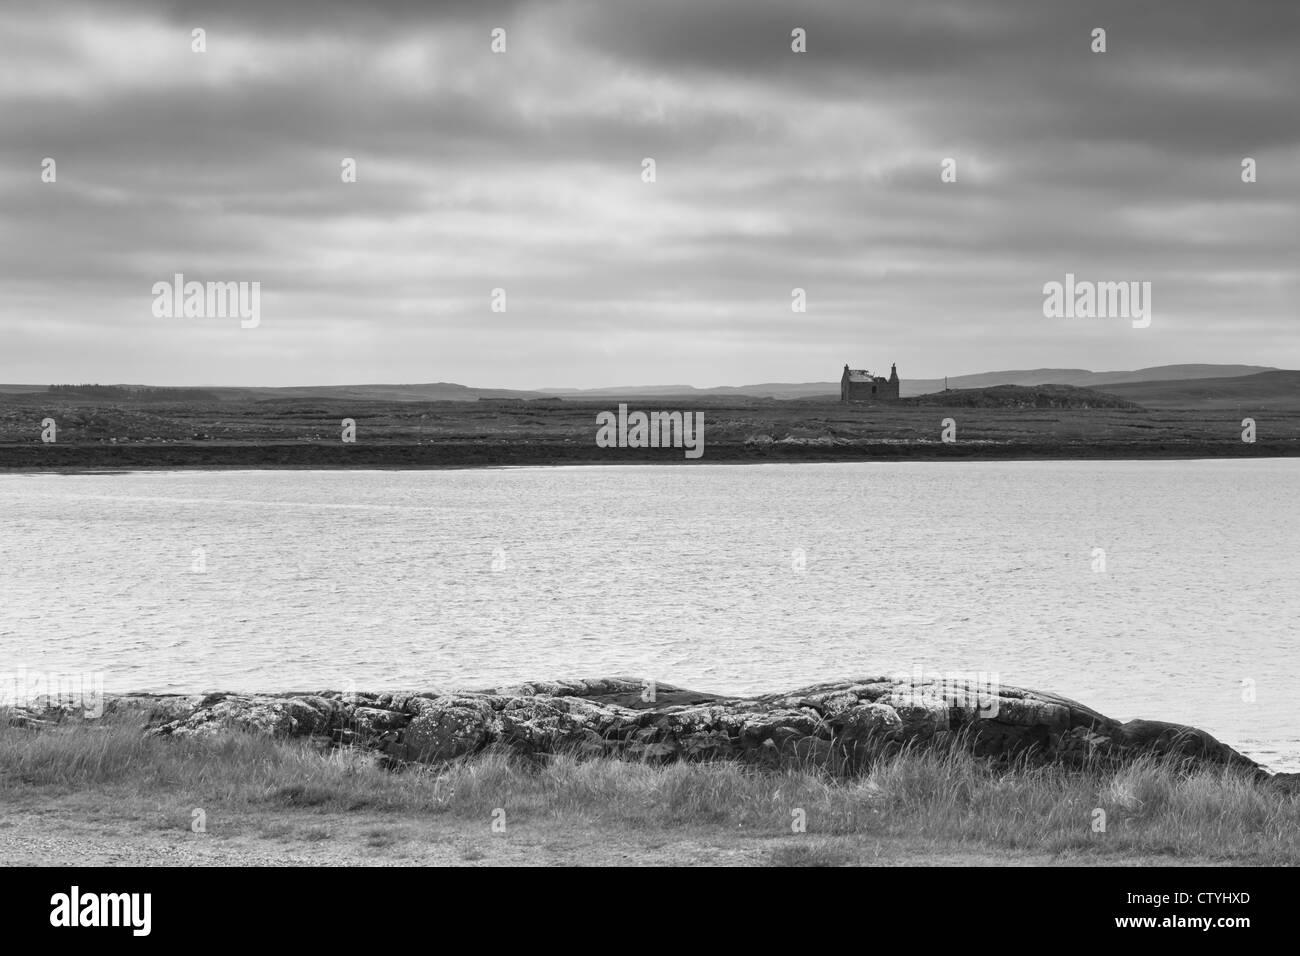 Scottish loch - Callanish (Outer Hebrides) - Stock Image